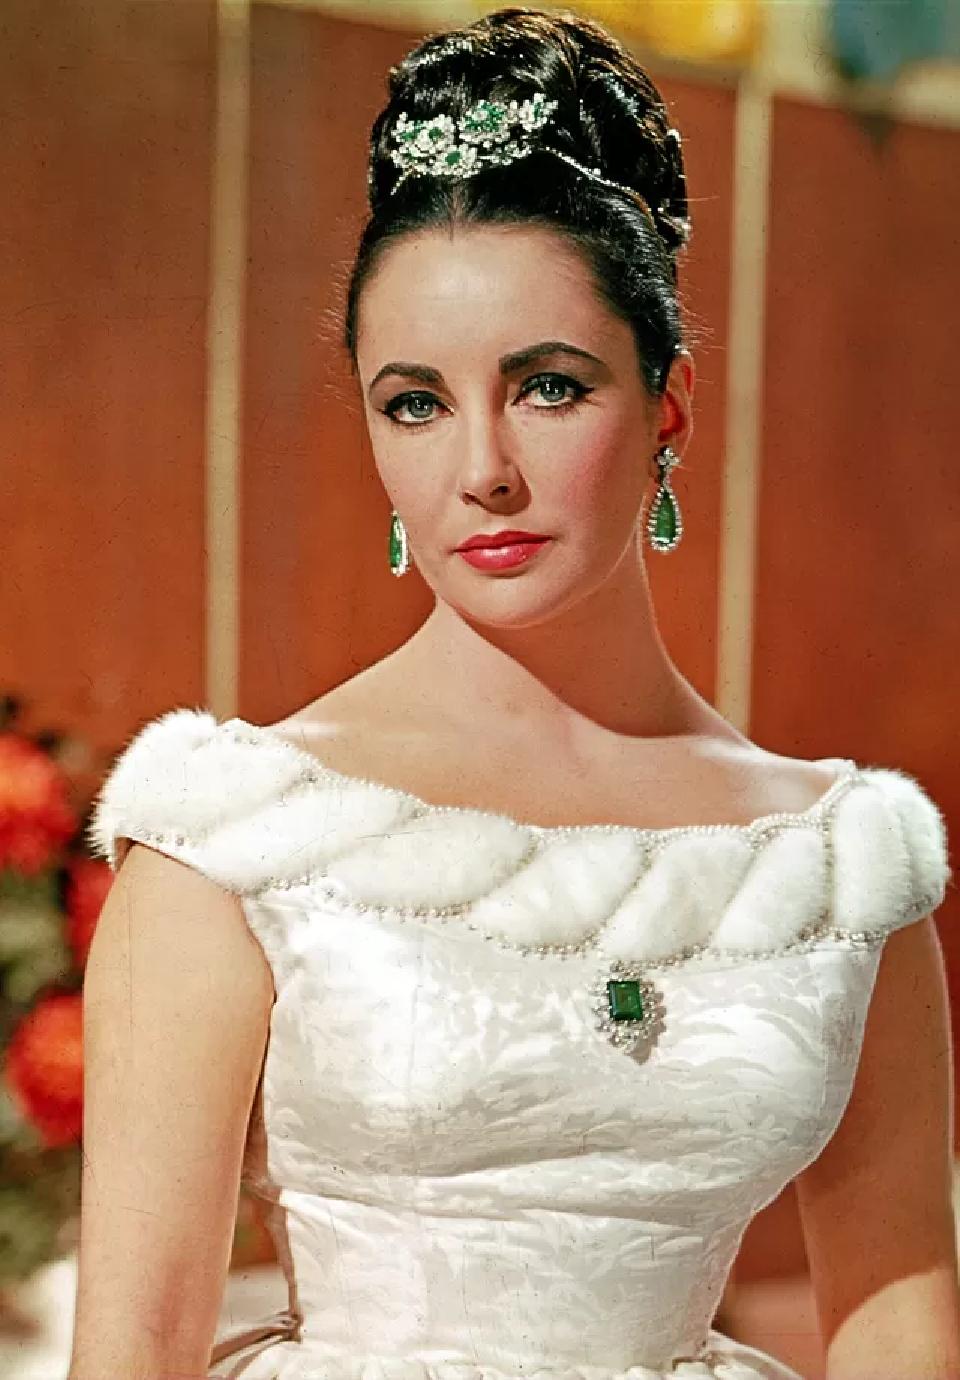 Celebrity Jewelry Elizabeth Taylor Wearing The Bulgari Jewelry with Green Emerald Stone and Rhinestones